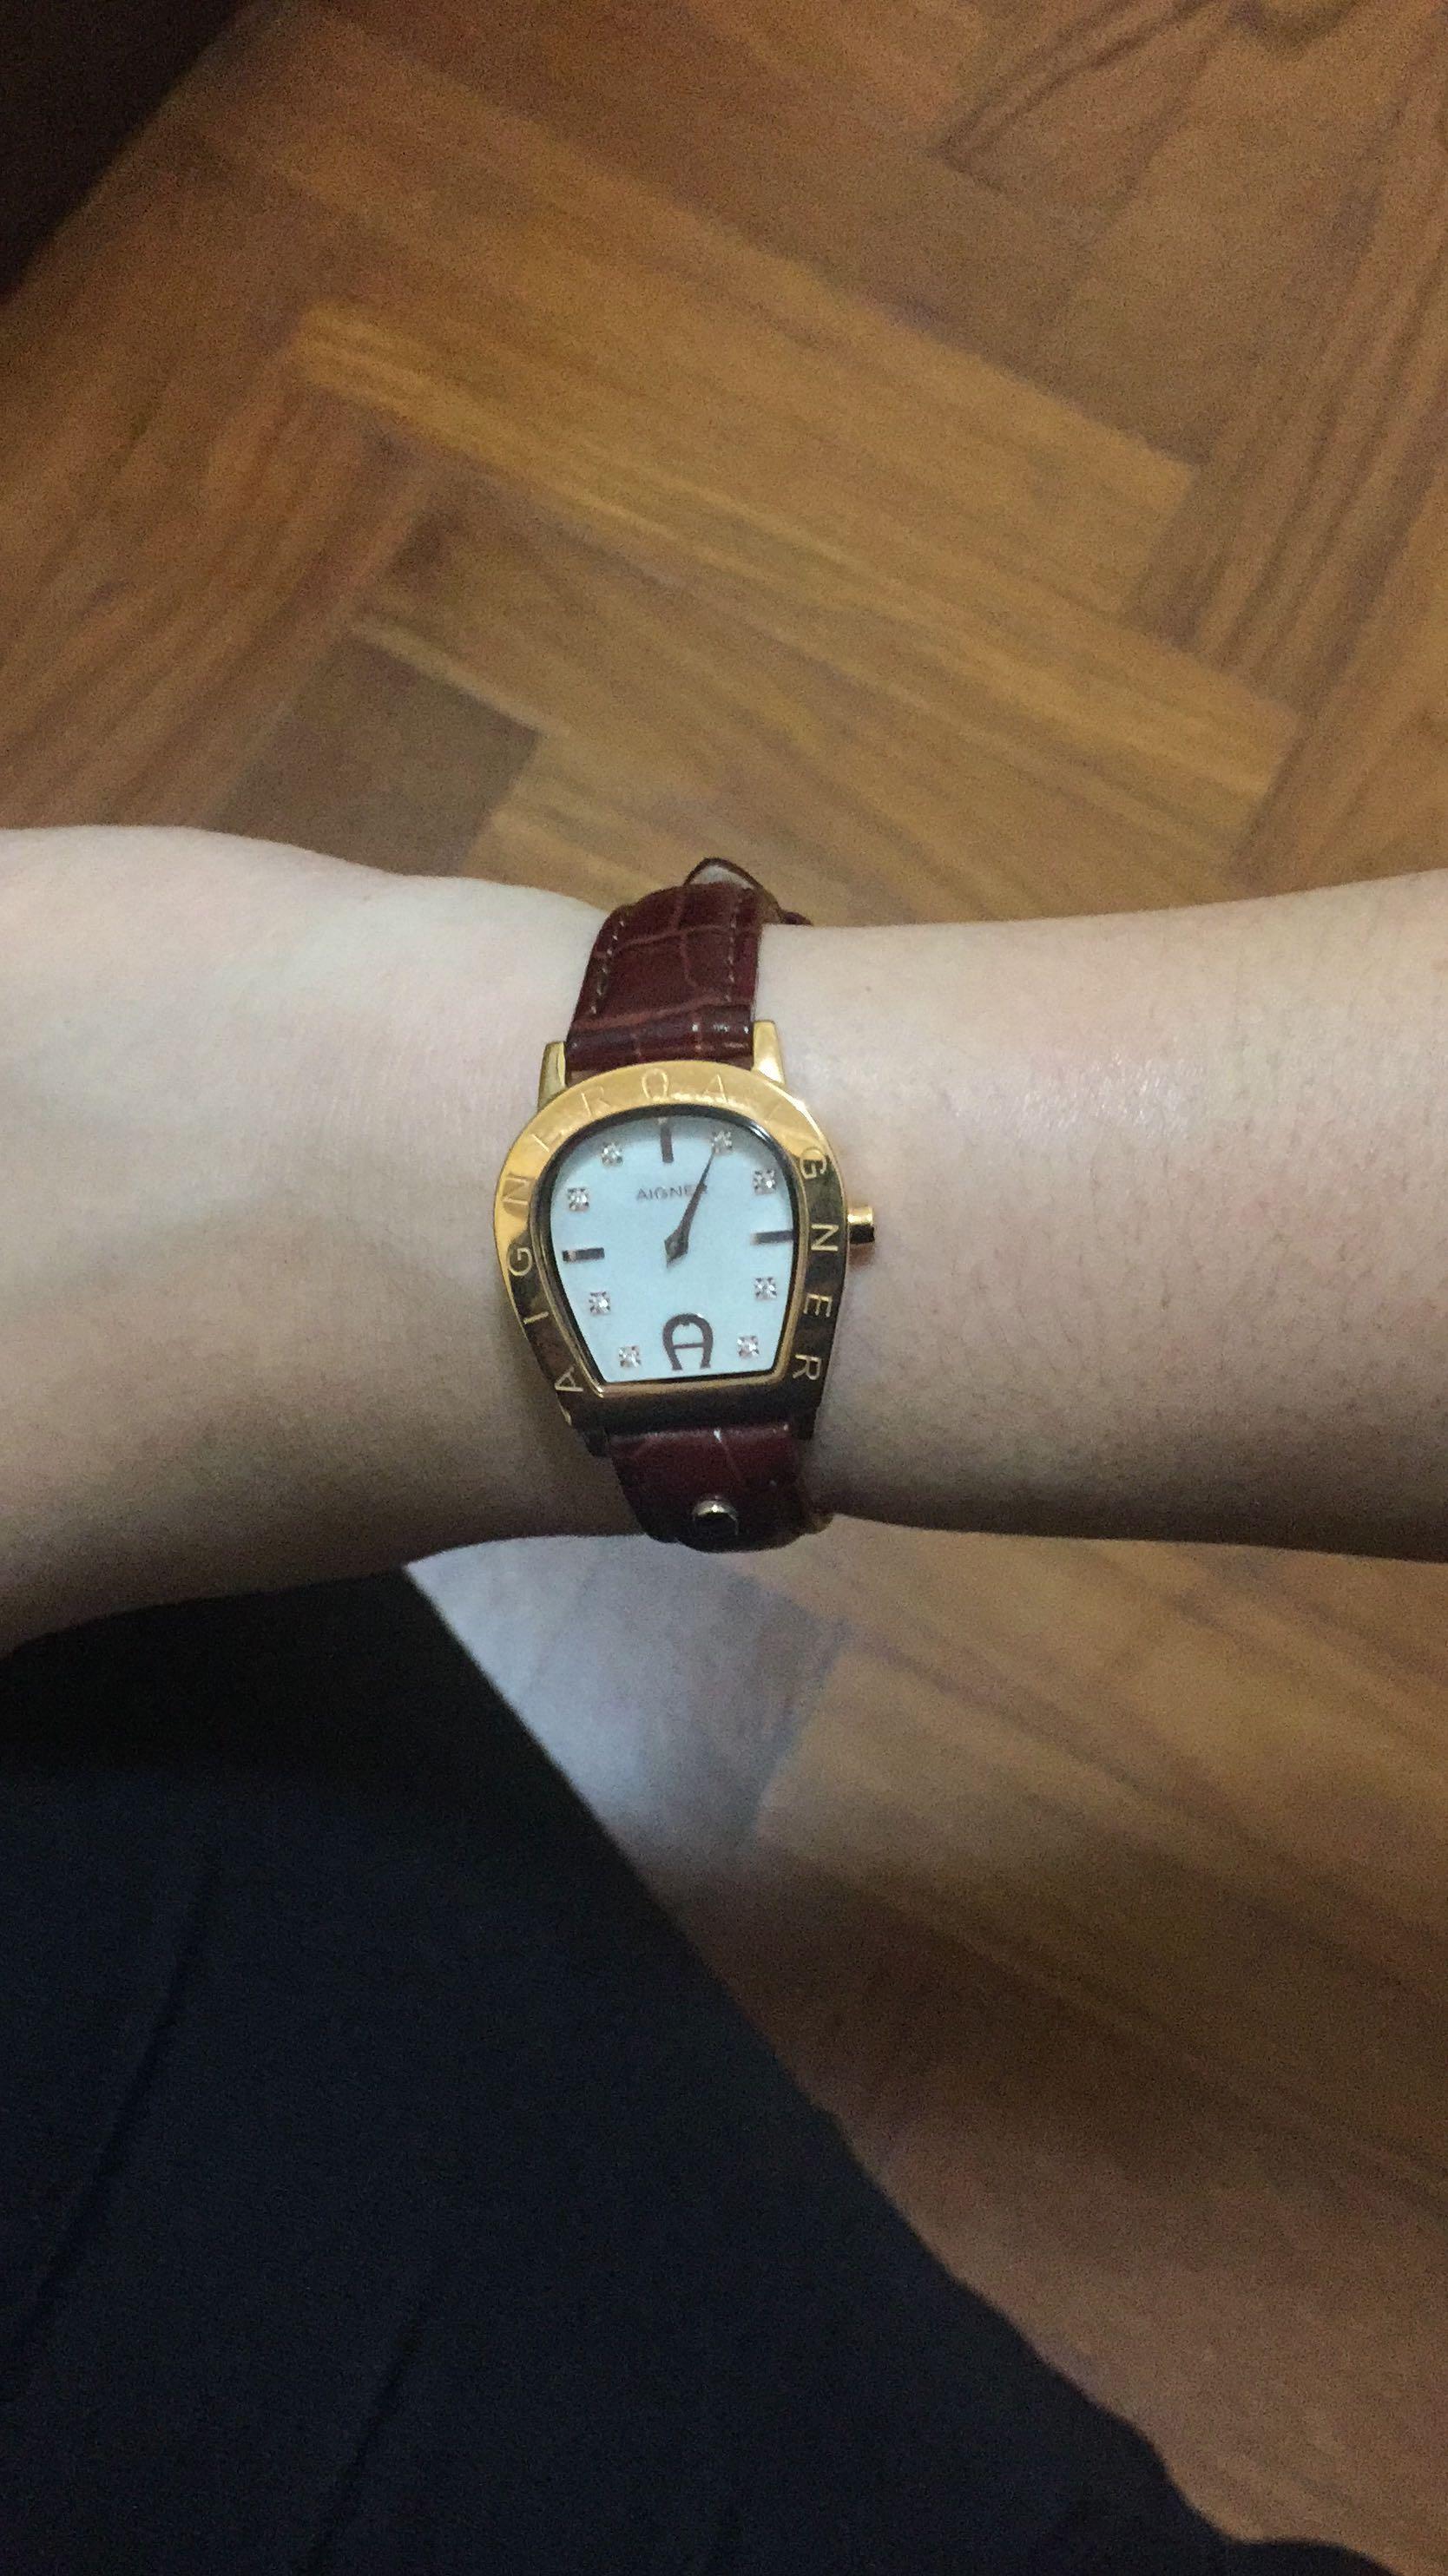 aigner la s watch 51a49aed